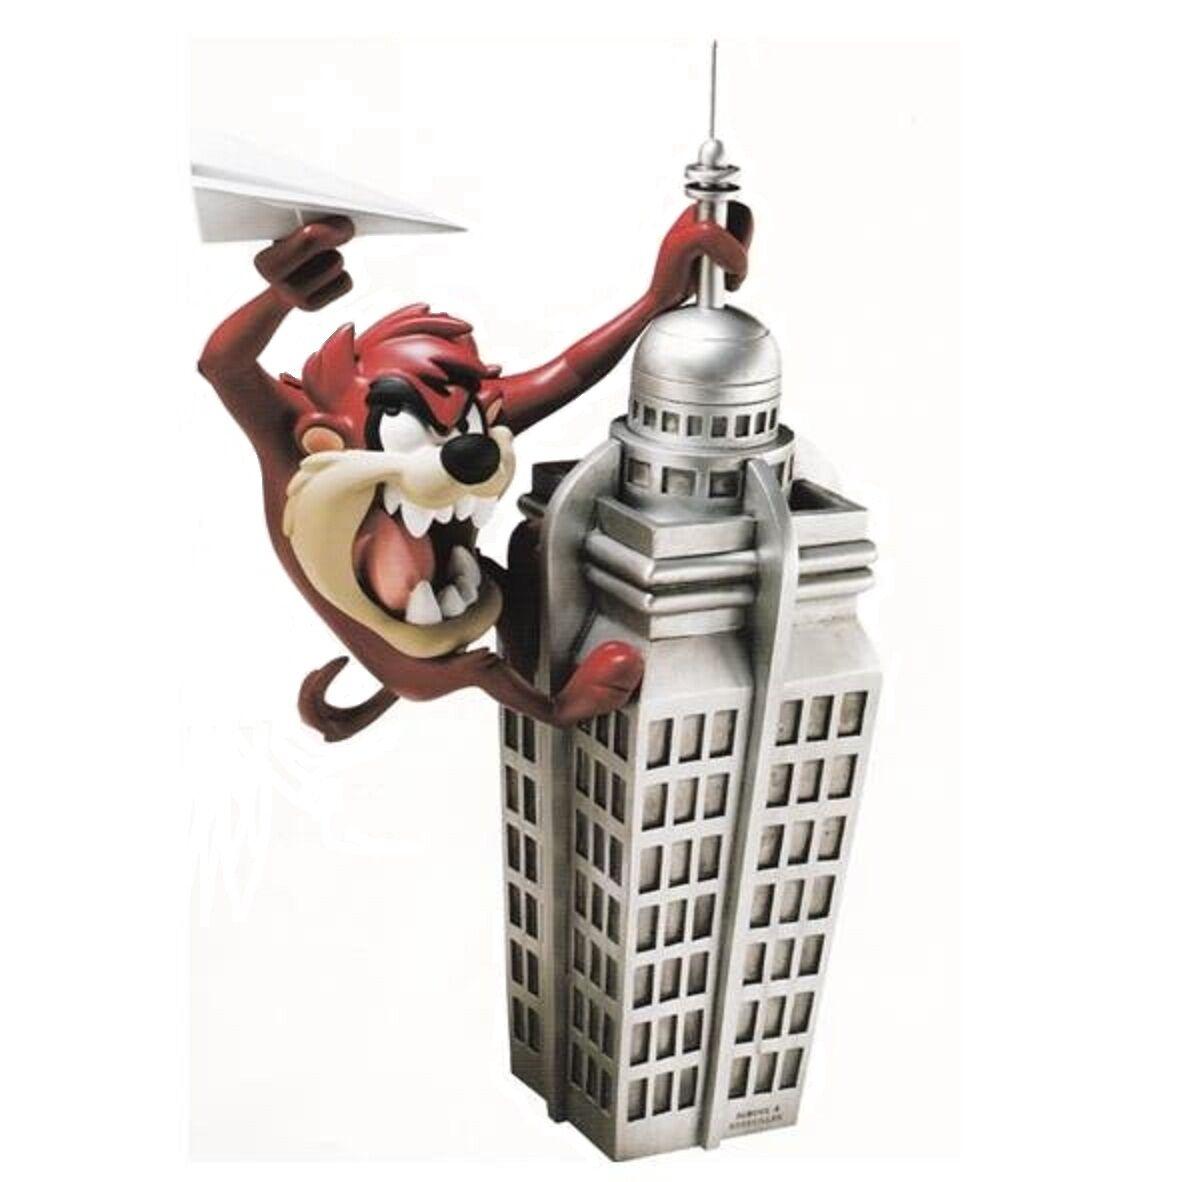 Taz TASMANIAN DEVIL in Empire State Building Demons & Merveilles Statue figure